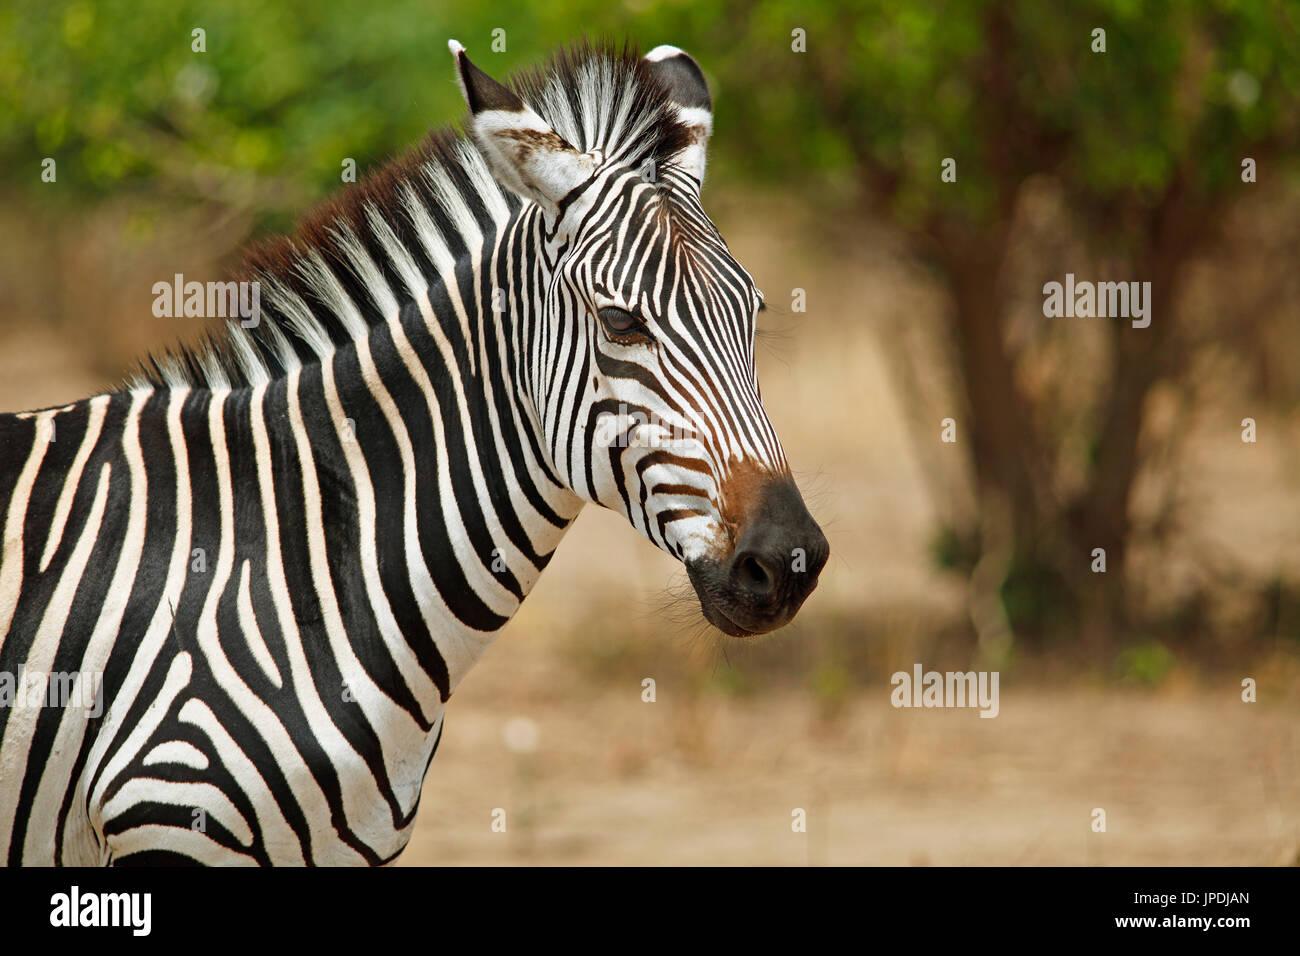 Llanuras cebra (Equus quagga), retrato de animales, el Parque Nacional Luangwa del Sur, Zambia Imagen De Stock